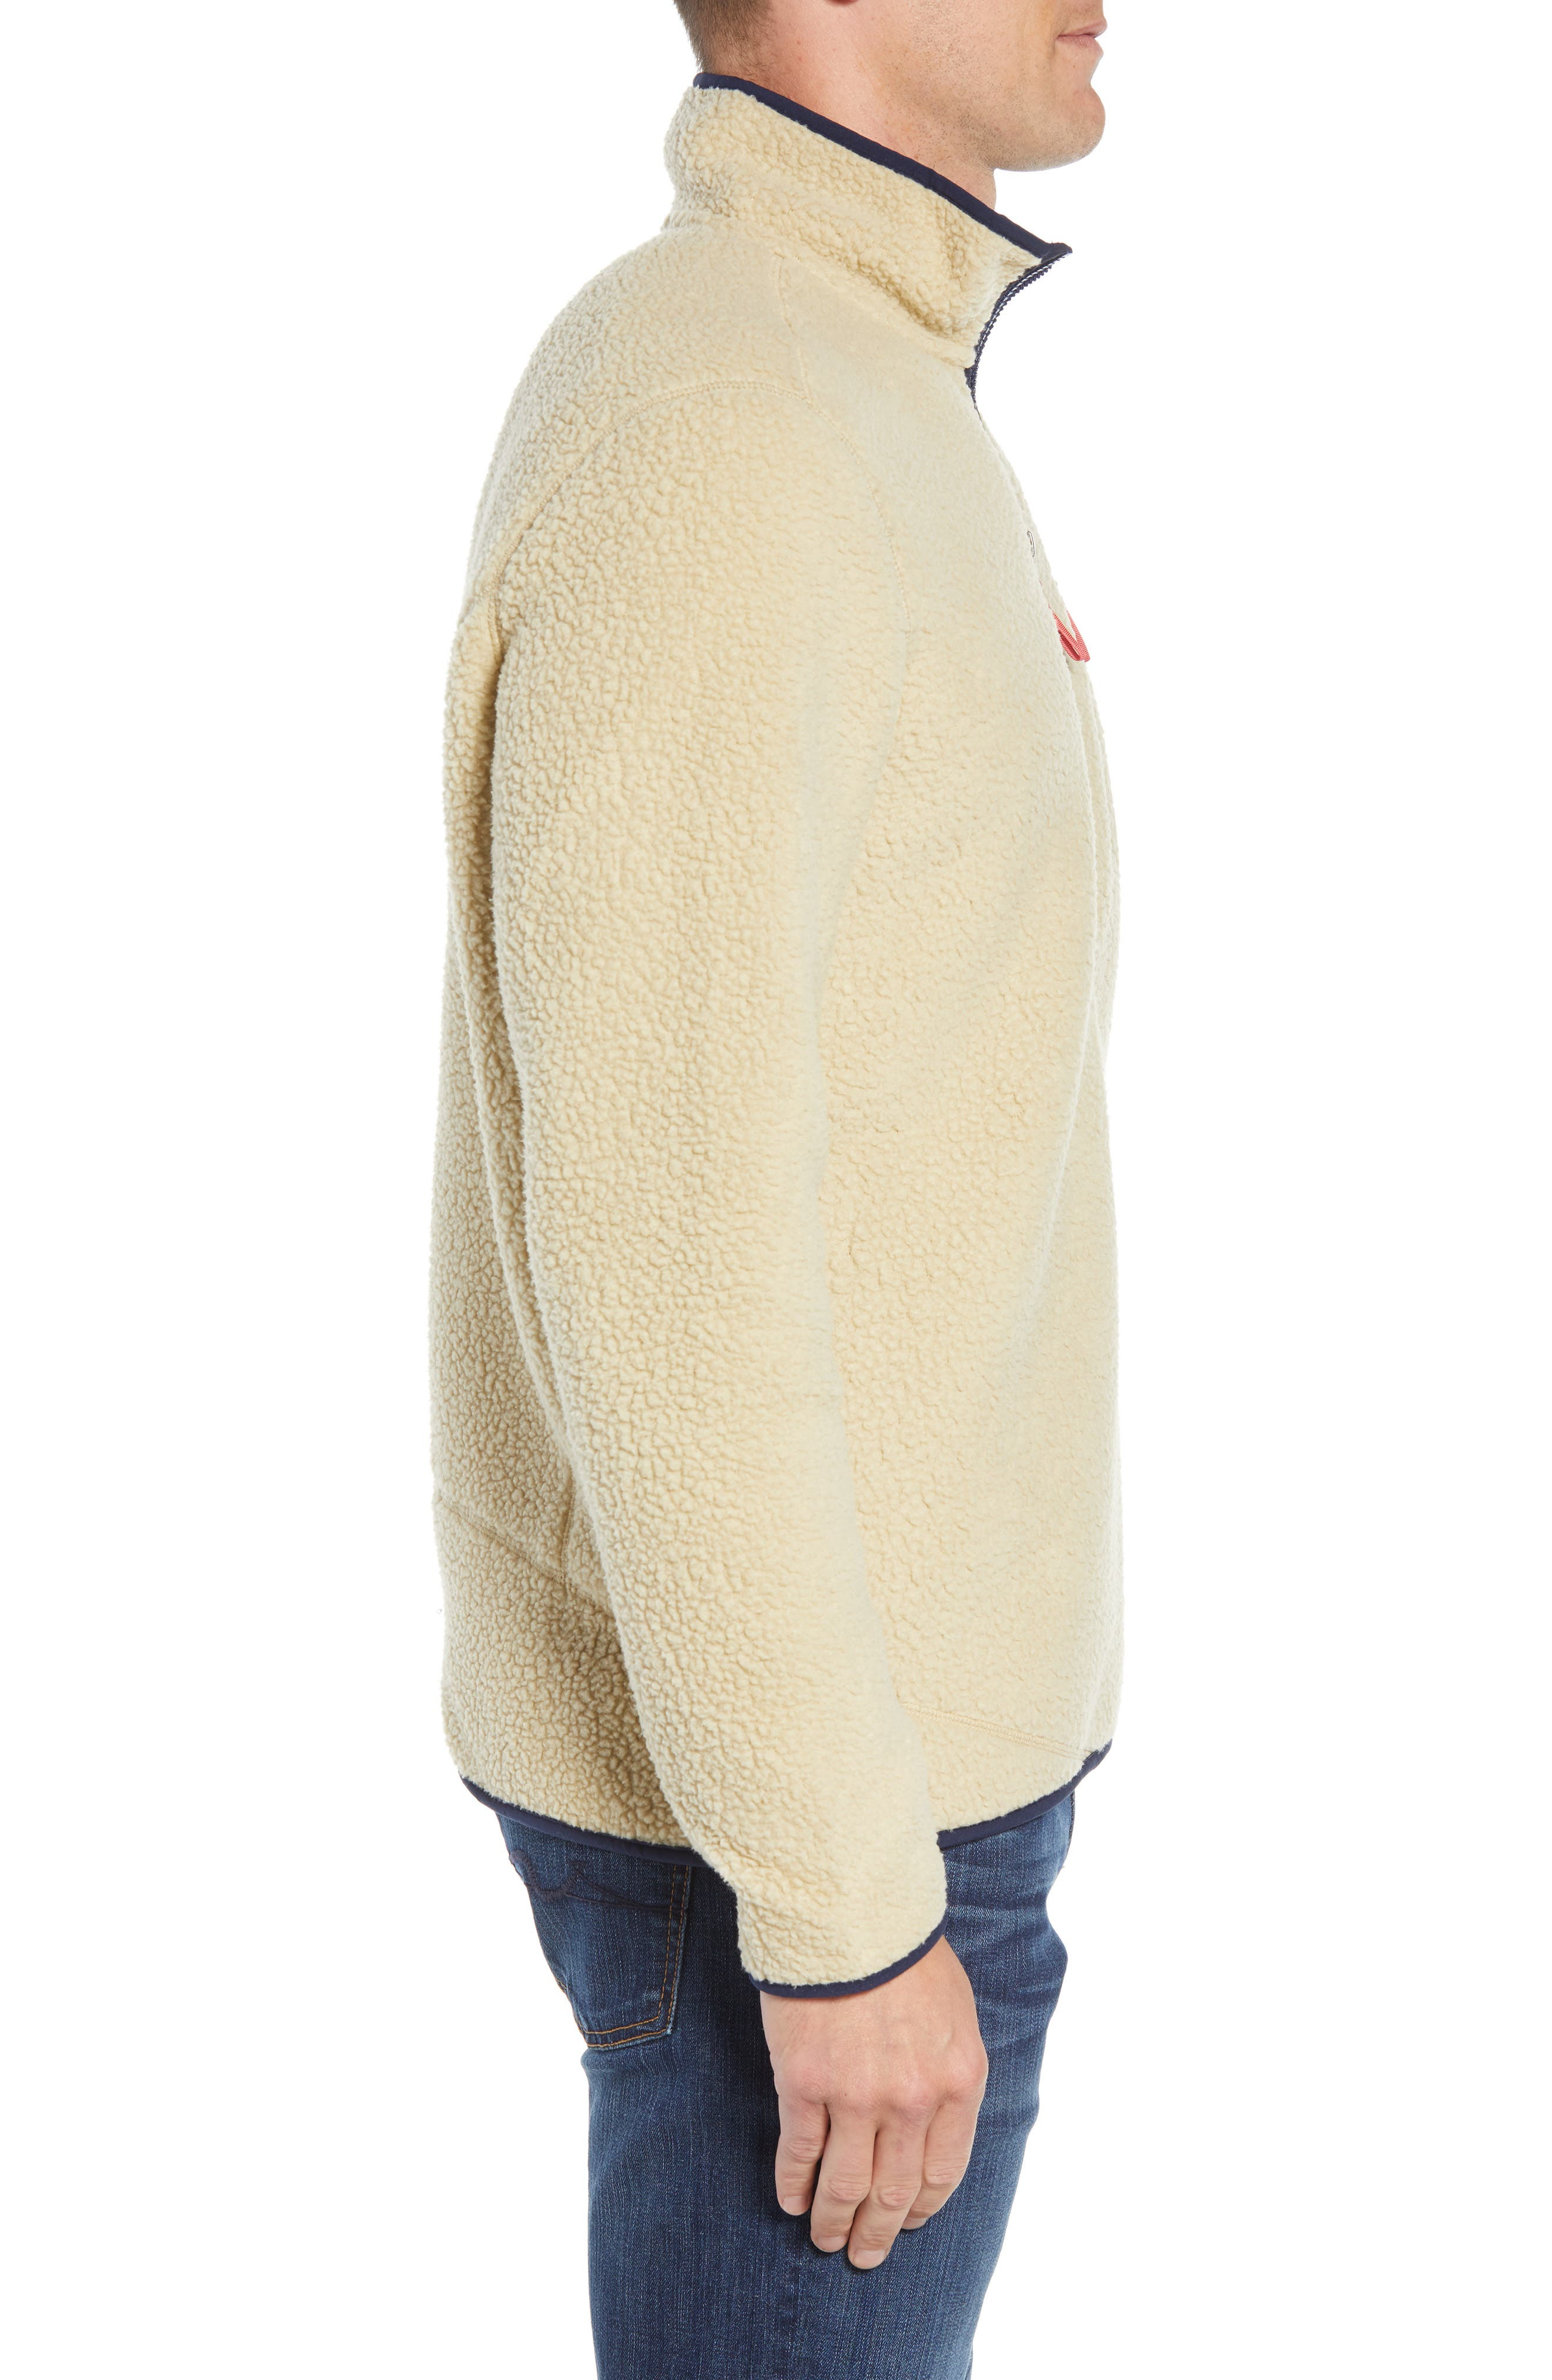 Retro Pile Fleece Zip Jacket,                             Alternate thumbnail 3, color,                             EL CAP KHAKI